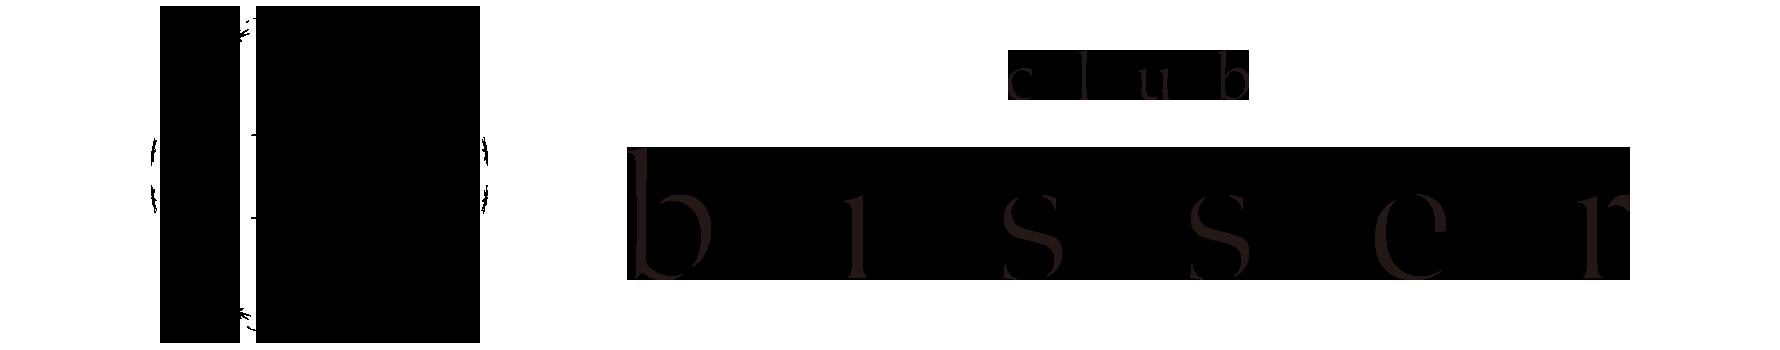 bisser池袋【ビゼイケブクロ】(池袋)のロゴ